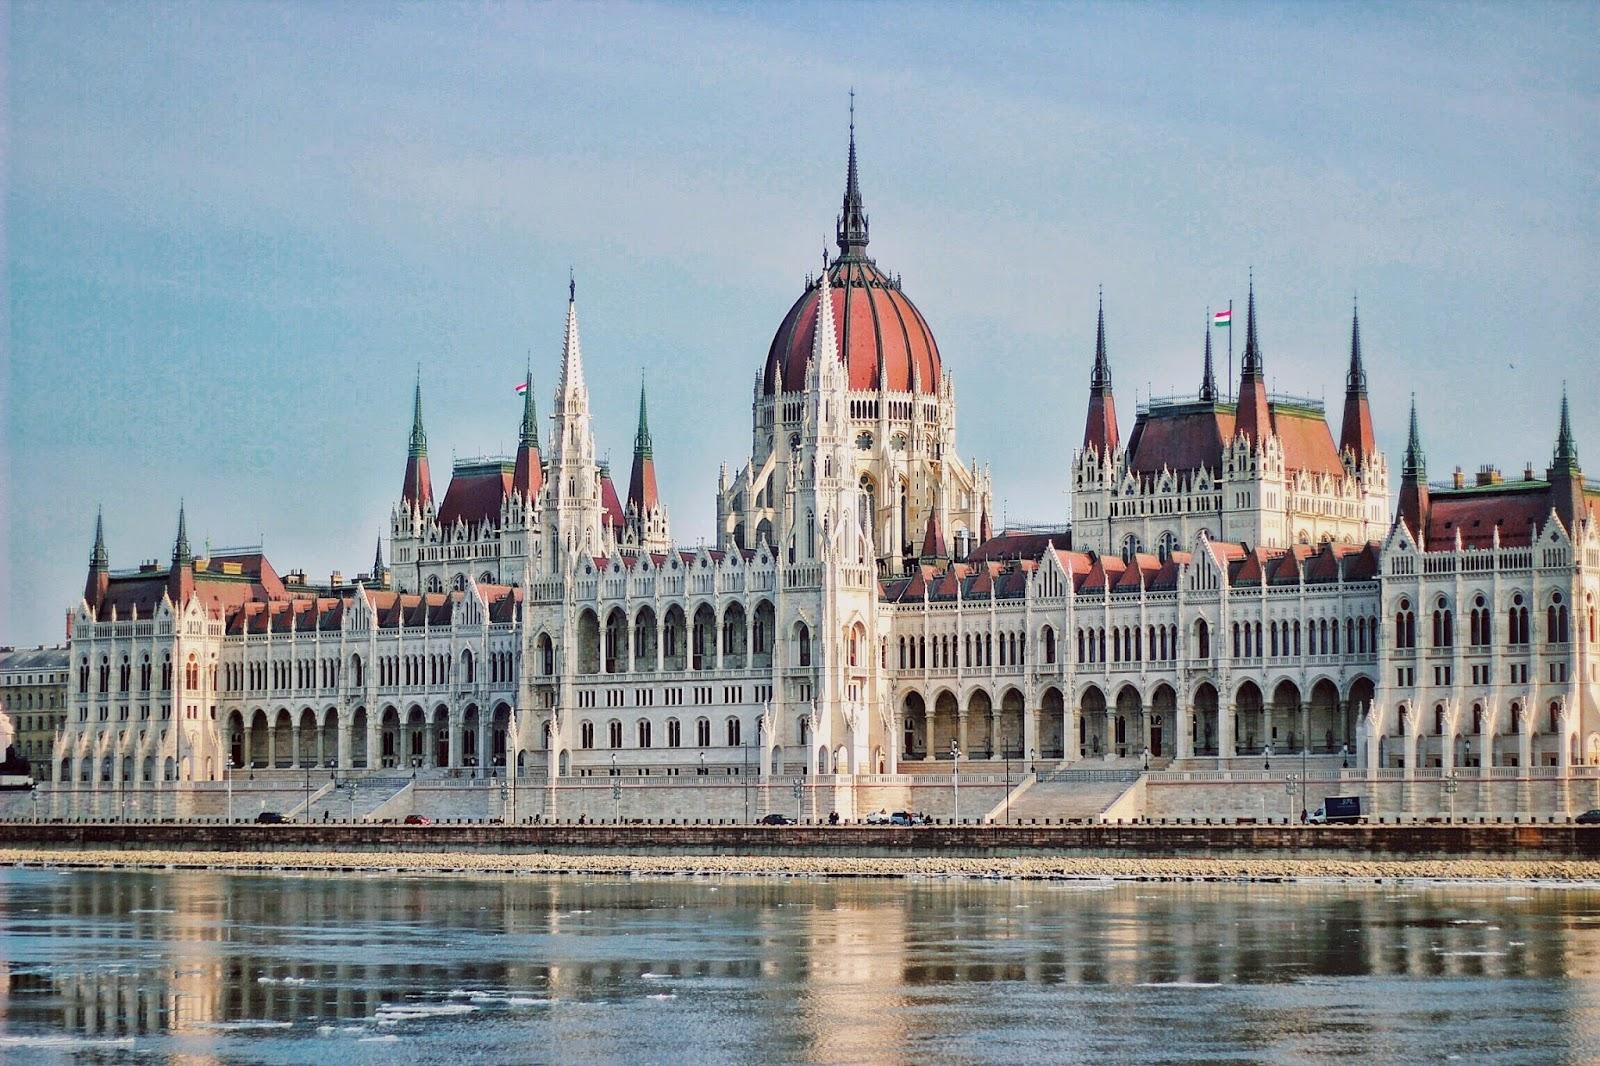 lifesthayle-budapest-hungarian-parliament-details.jpg